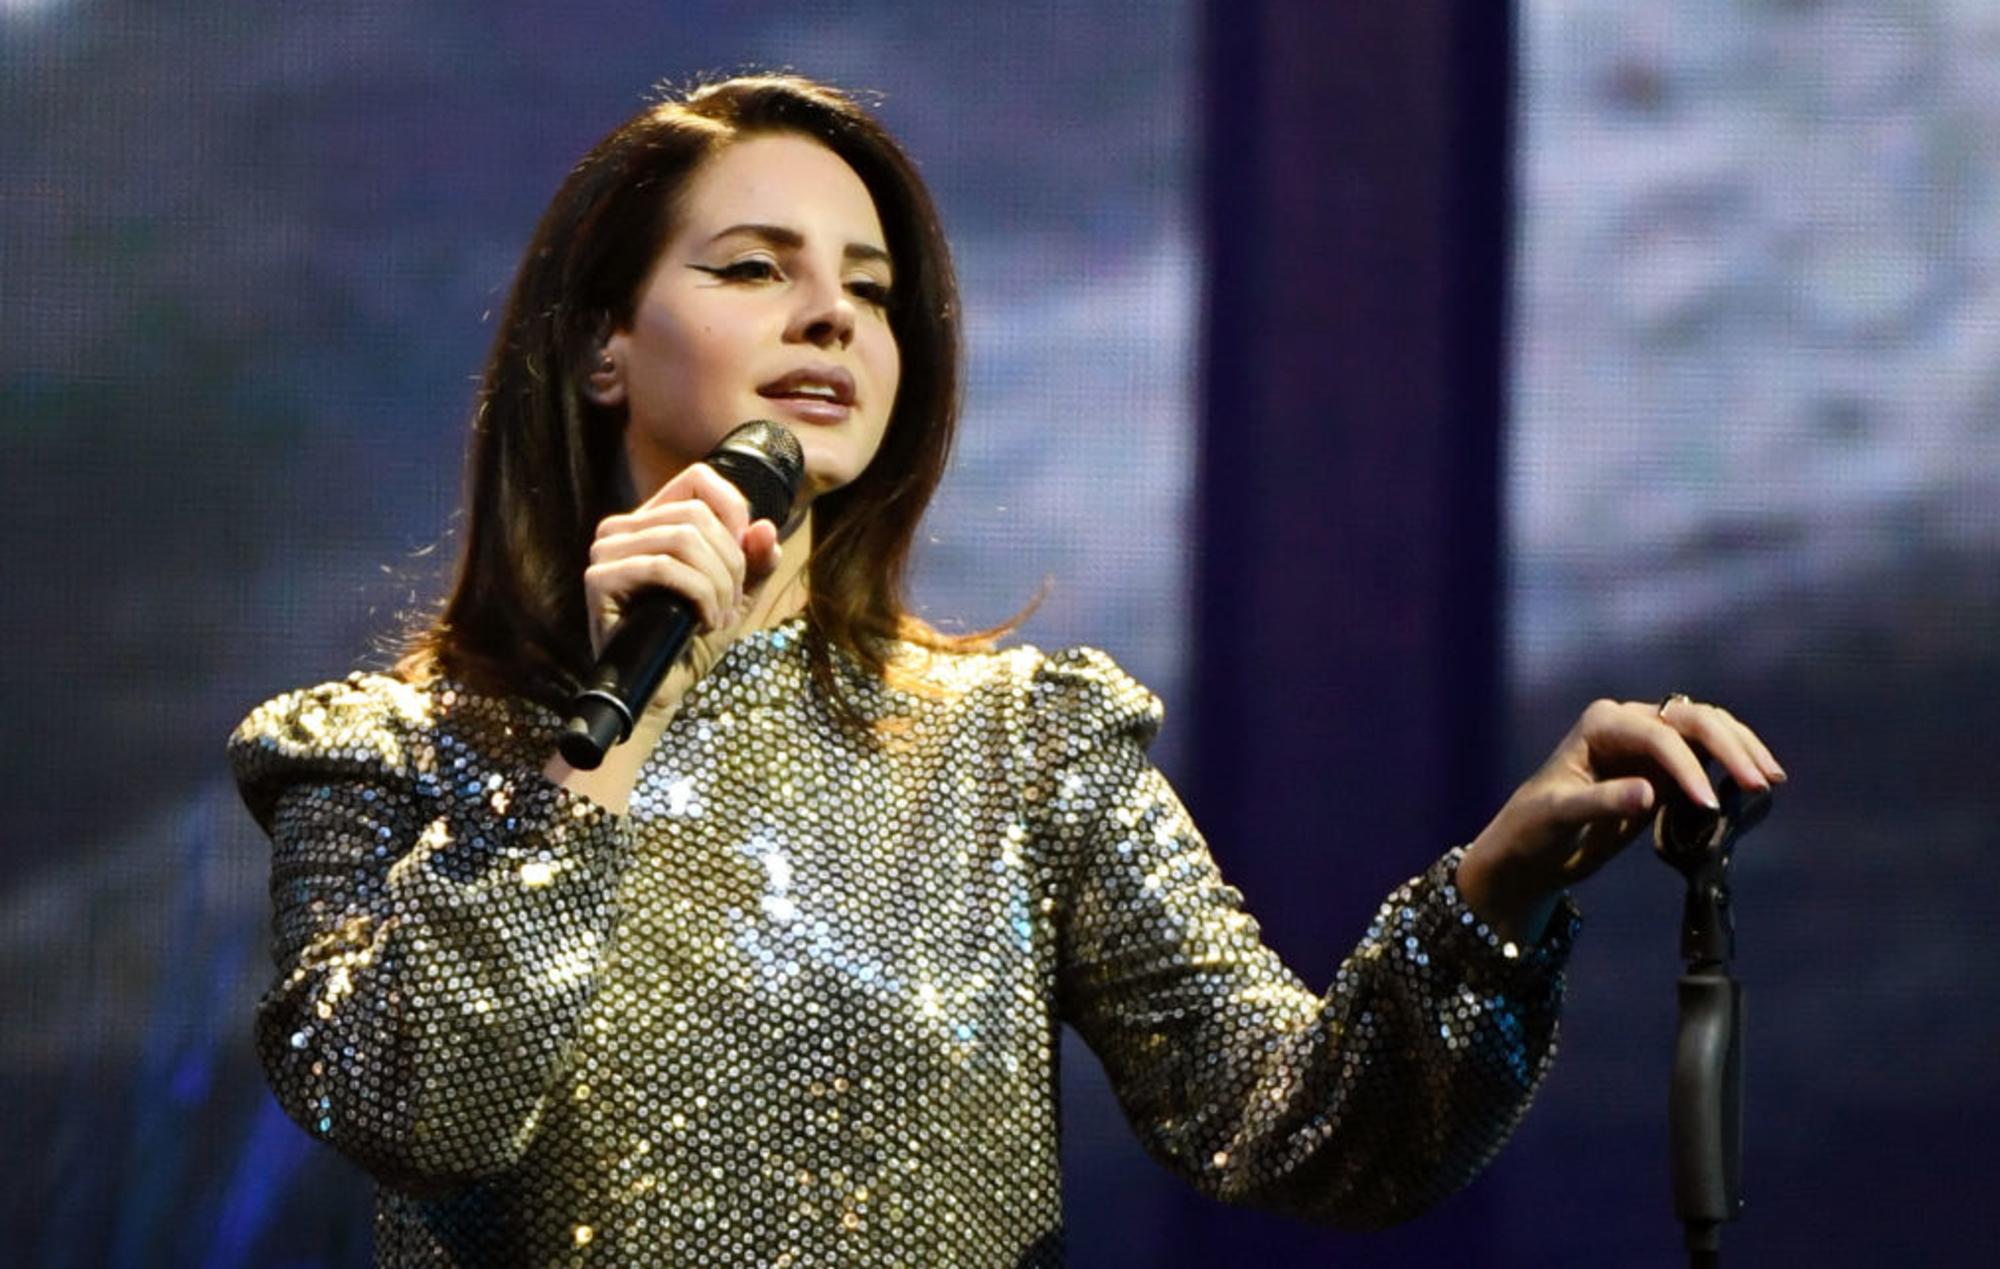 Lana Del Rey Discusses Instagram Backlash In Lengthy New Message